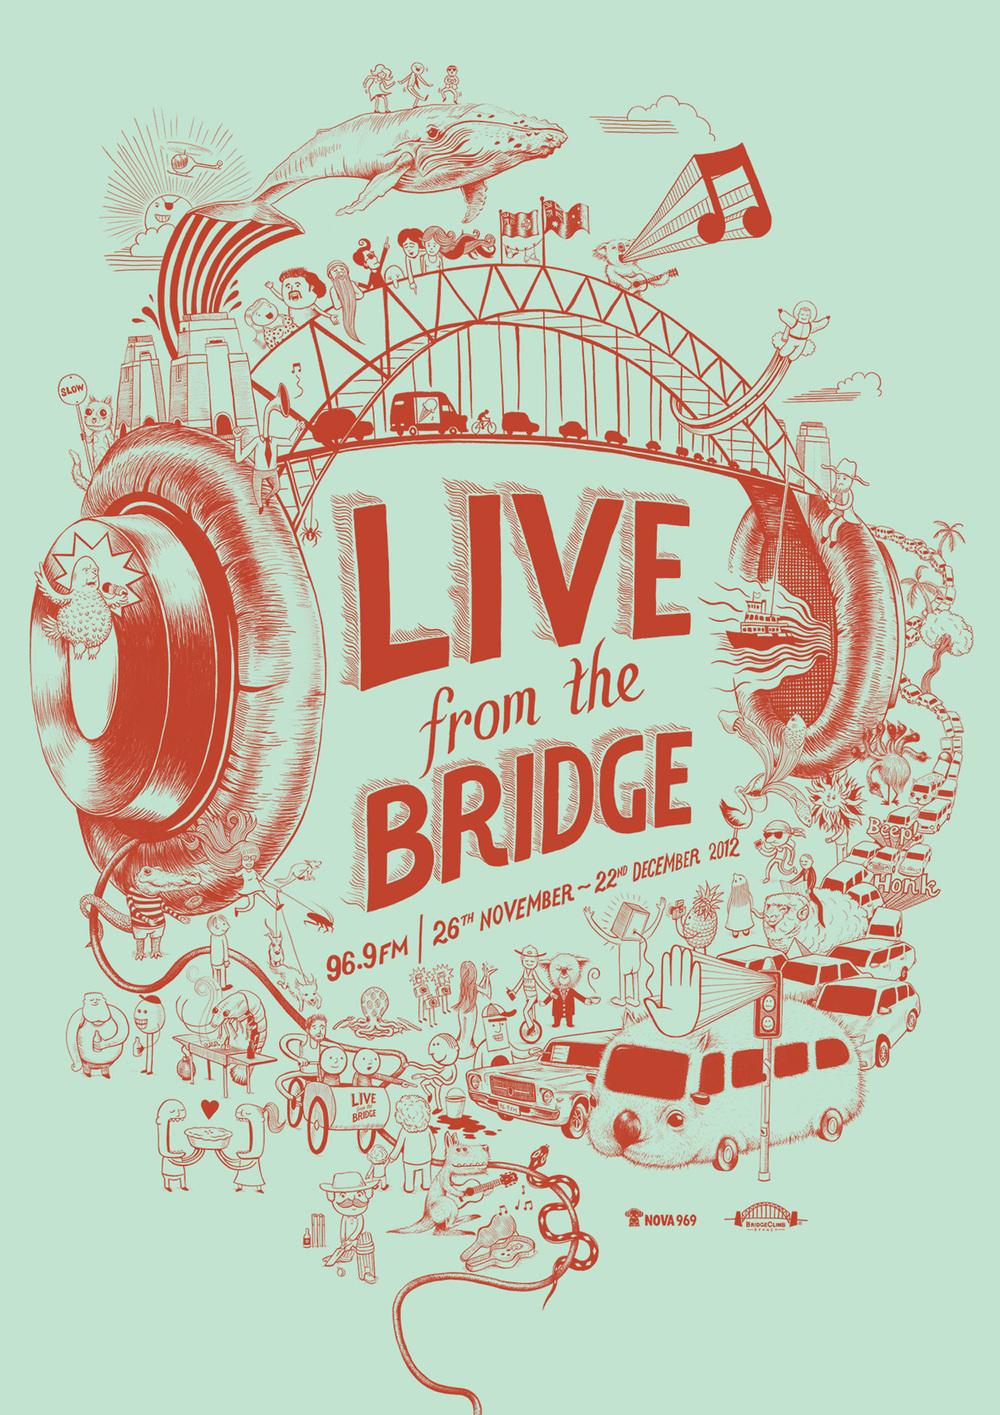 live-from-the-bridge-poster-sydney-nova.jpg